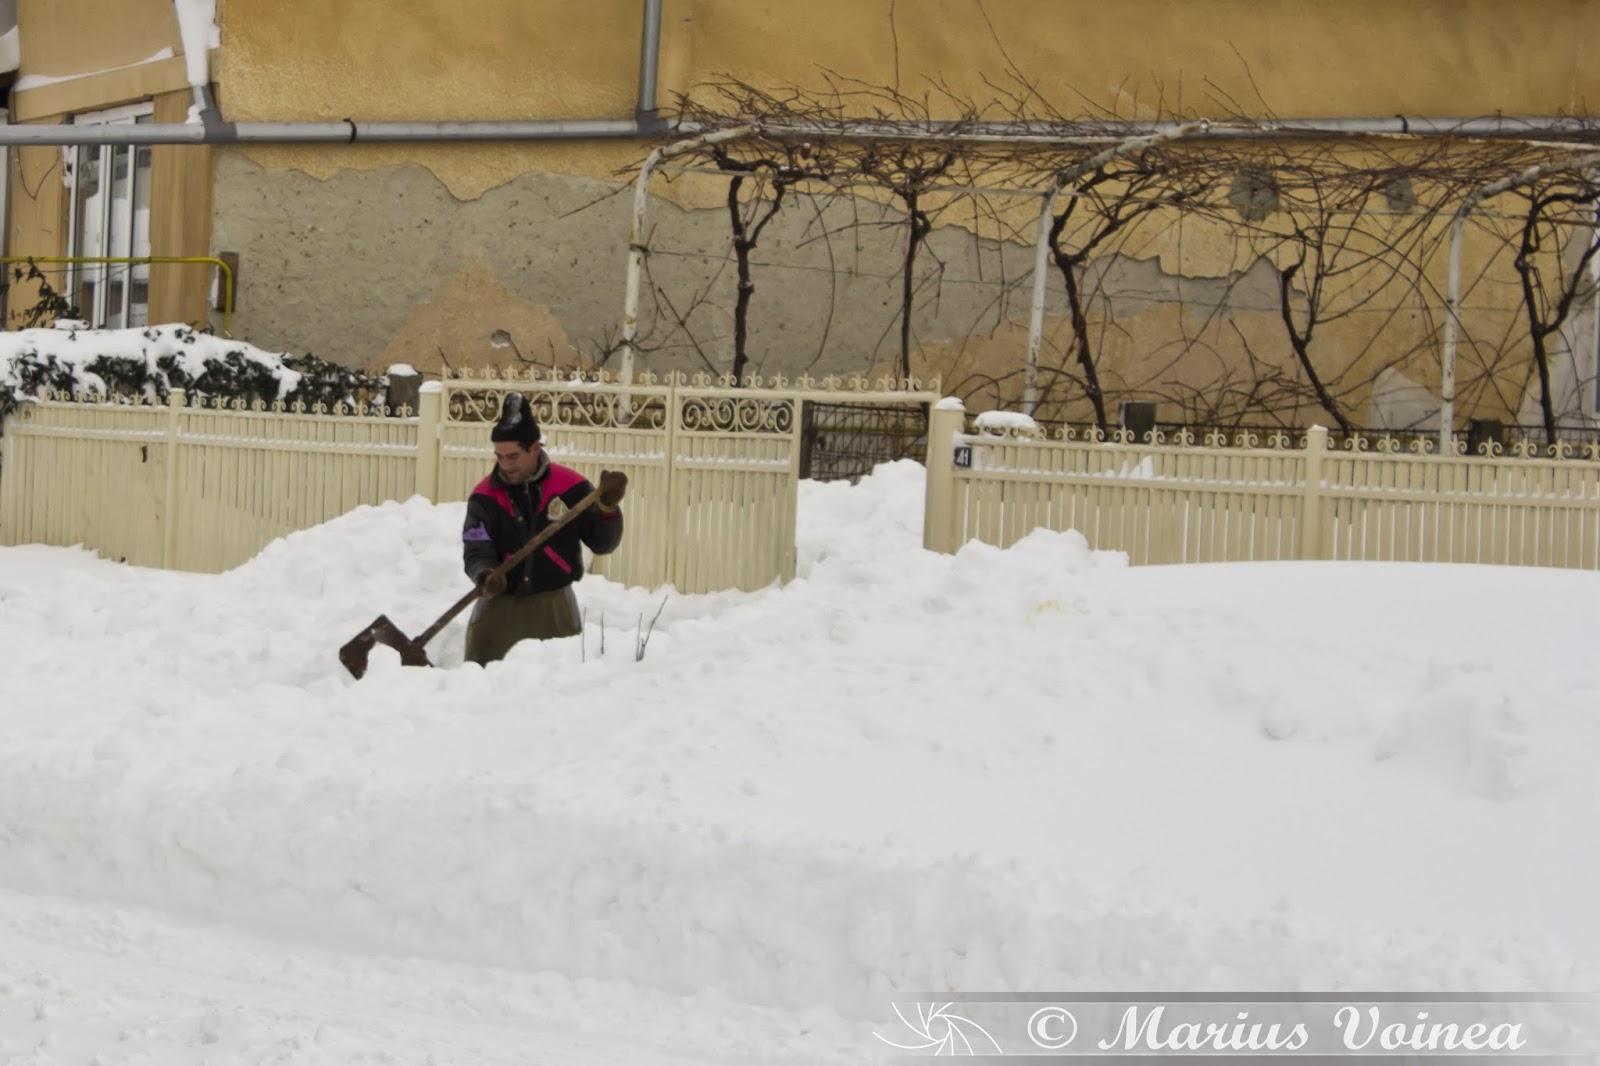 iarna la ramnicu sarat, 2014 foto 3